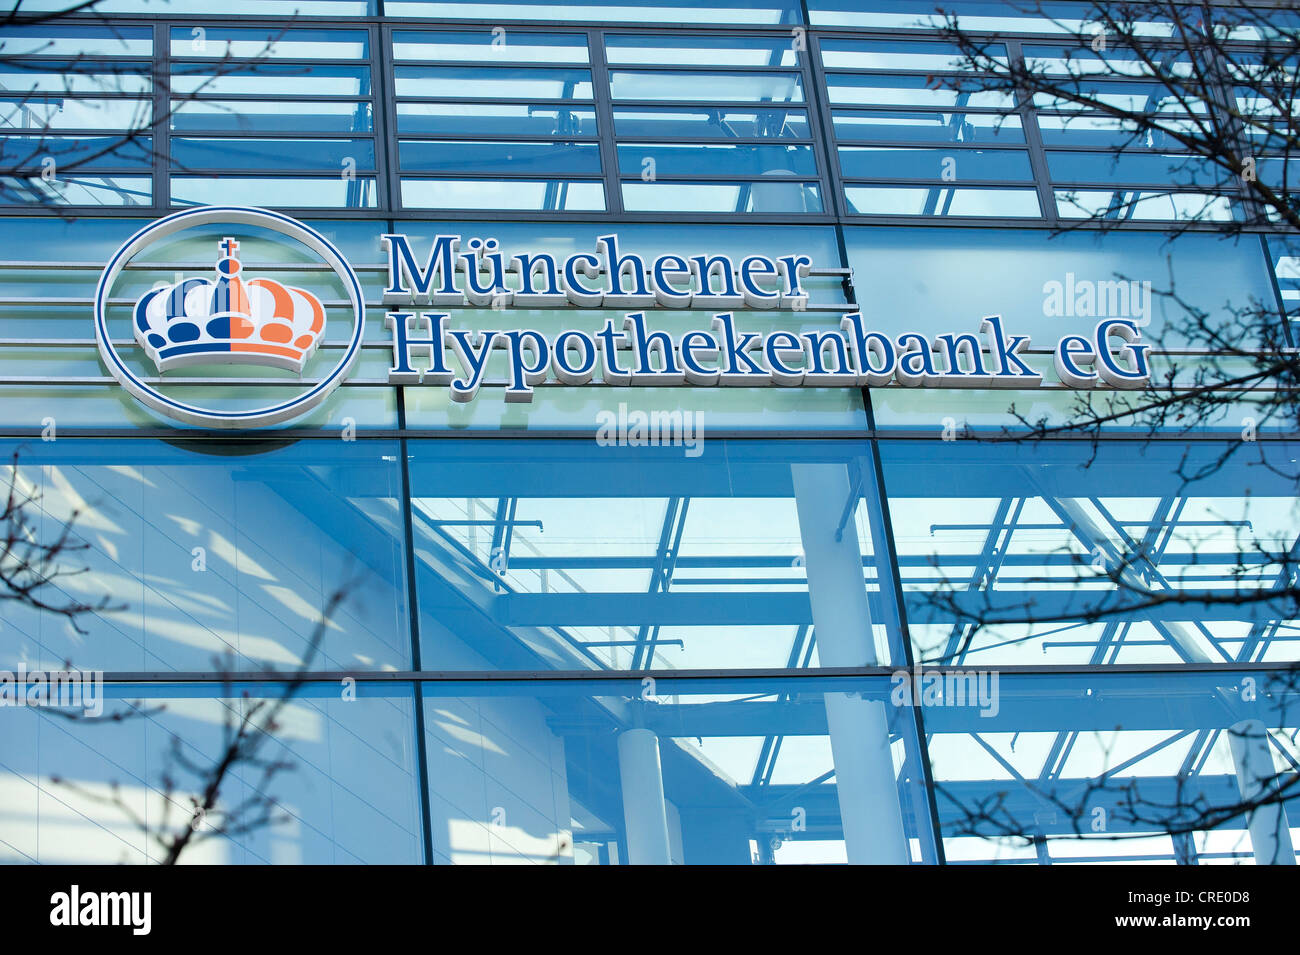 Muenchner Hypothekenbank e.G., Munich, Bavaria, Germany, Europe - Stock Image